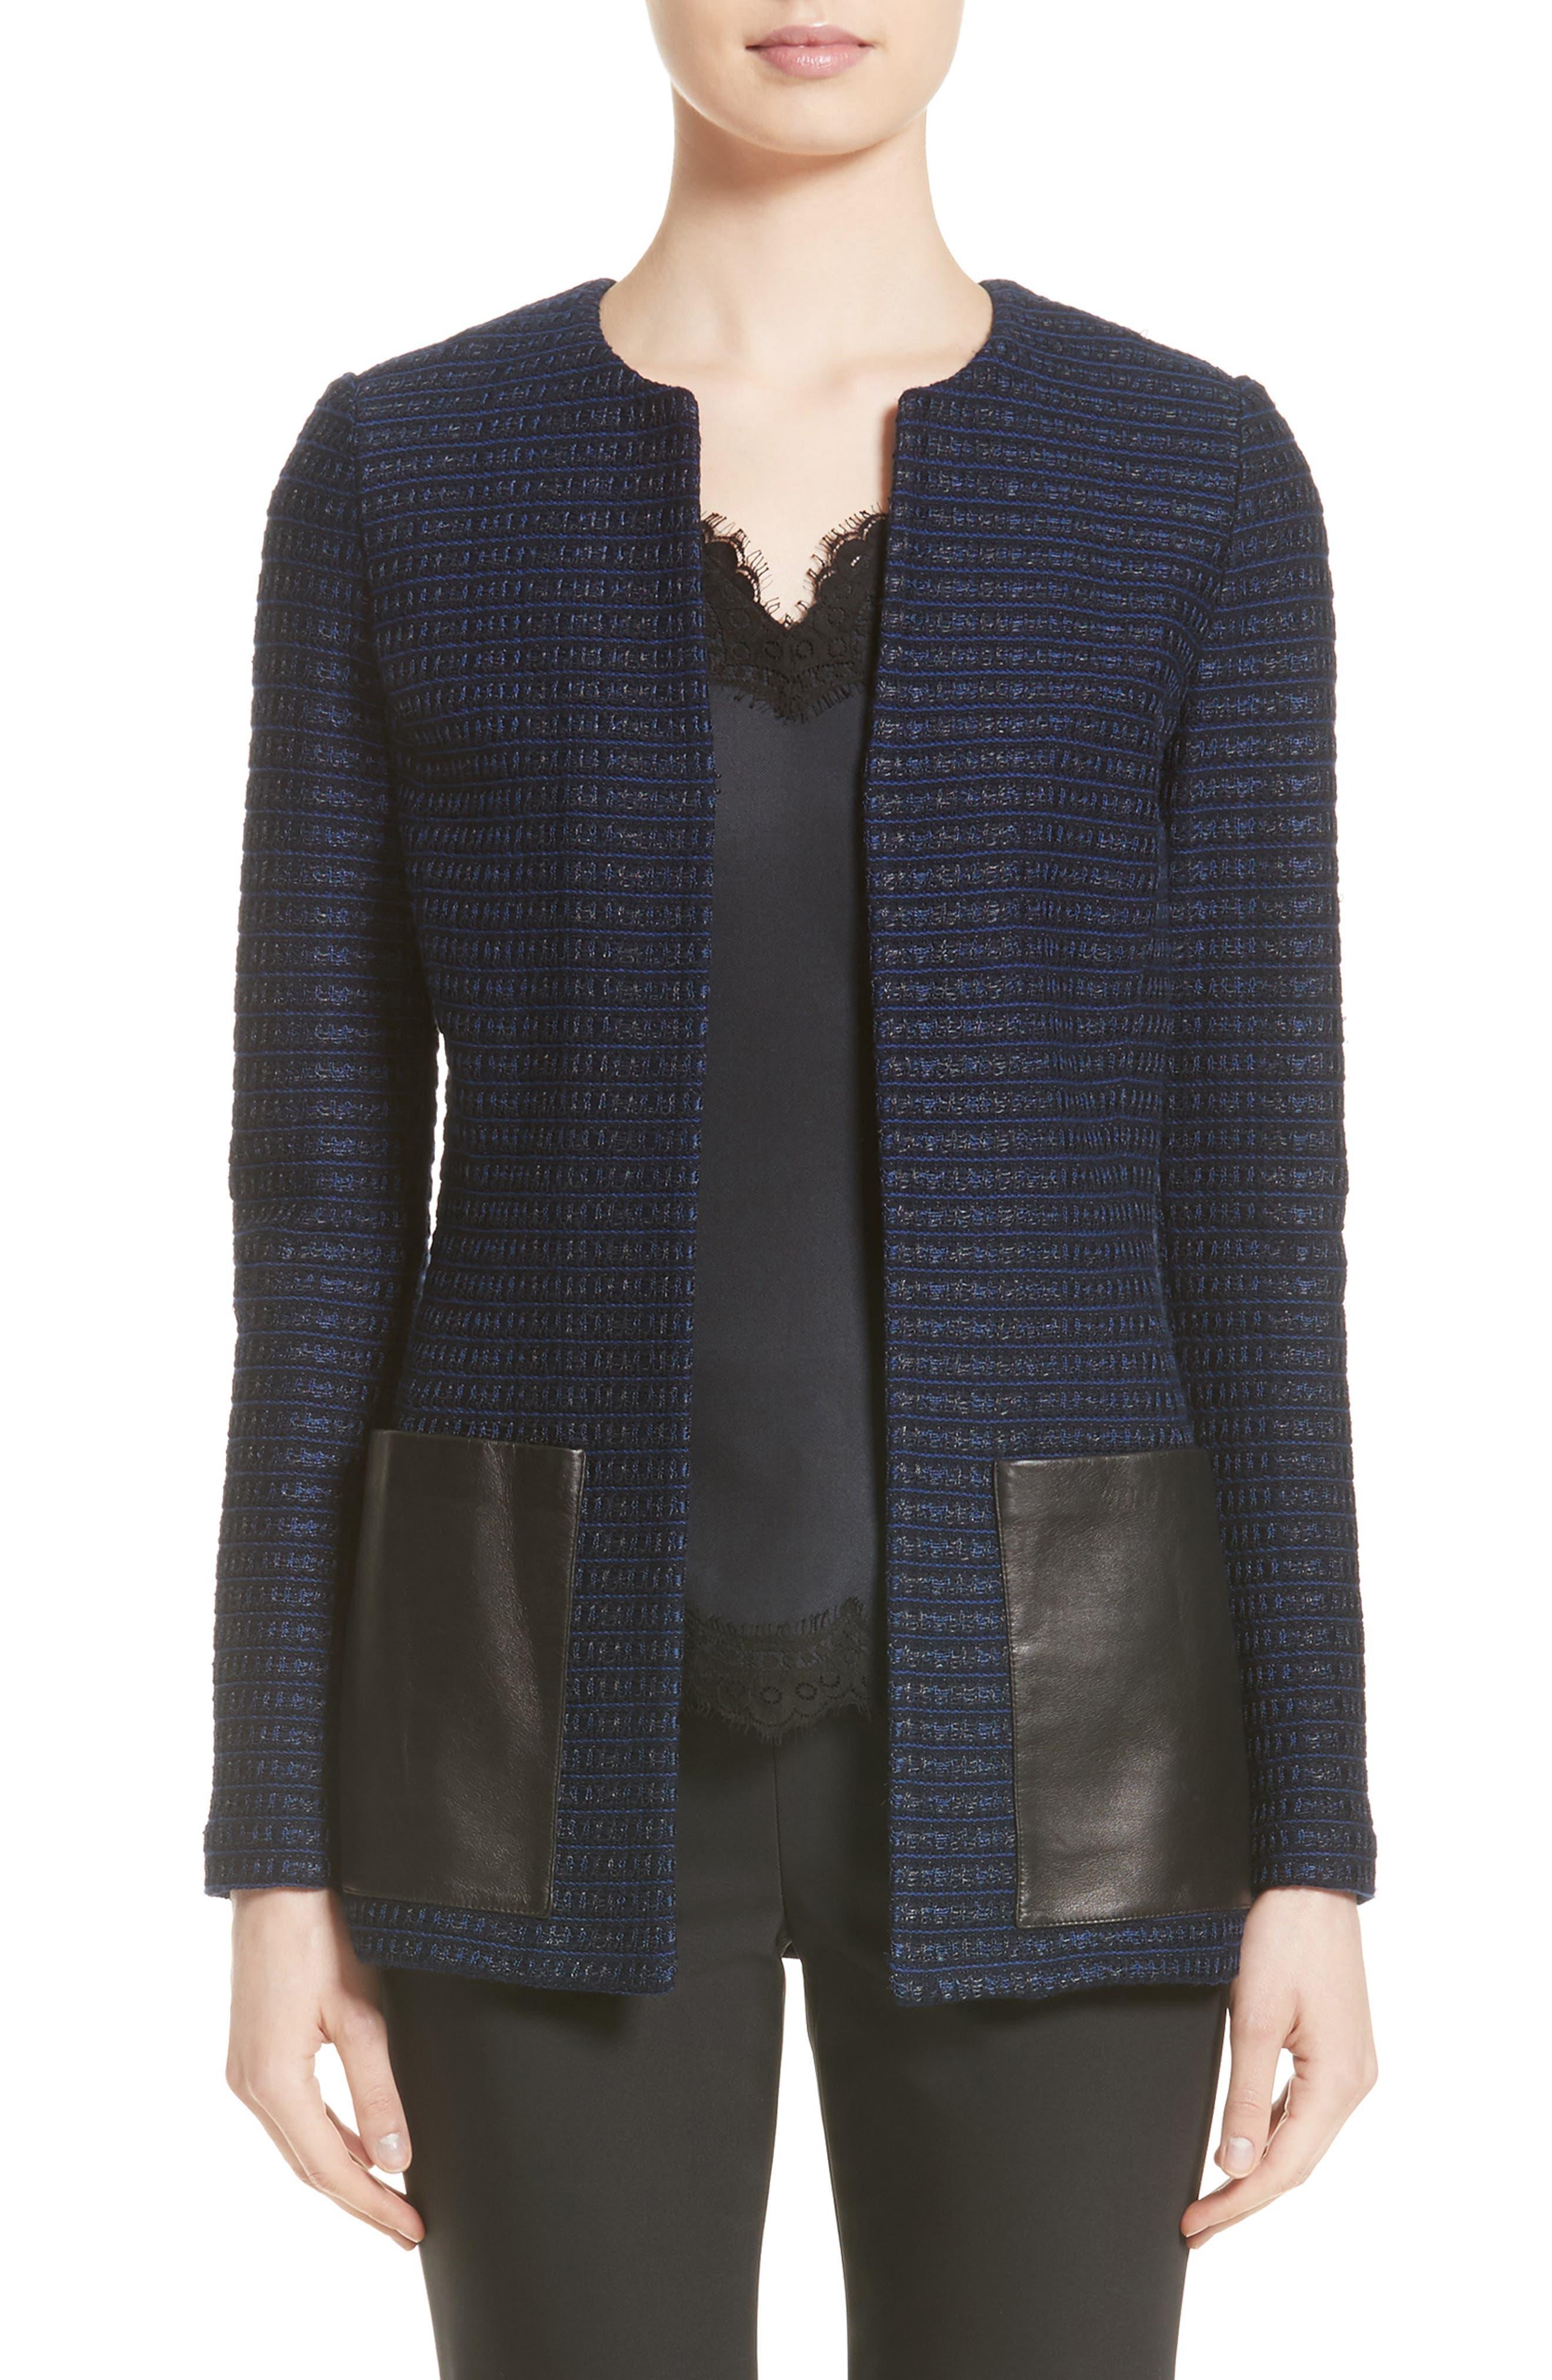 ST. JOHN COLLECTION Glazed Ribbon Tweed Knit Jacket